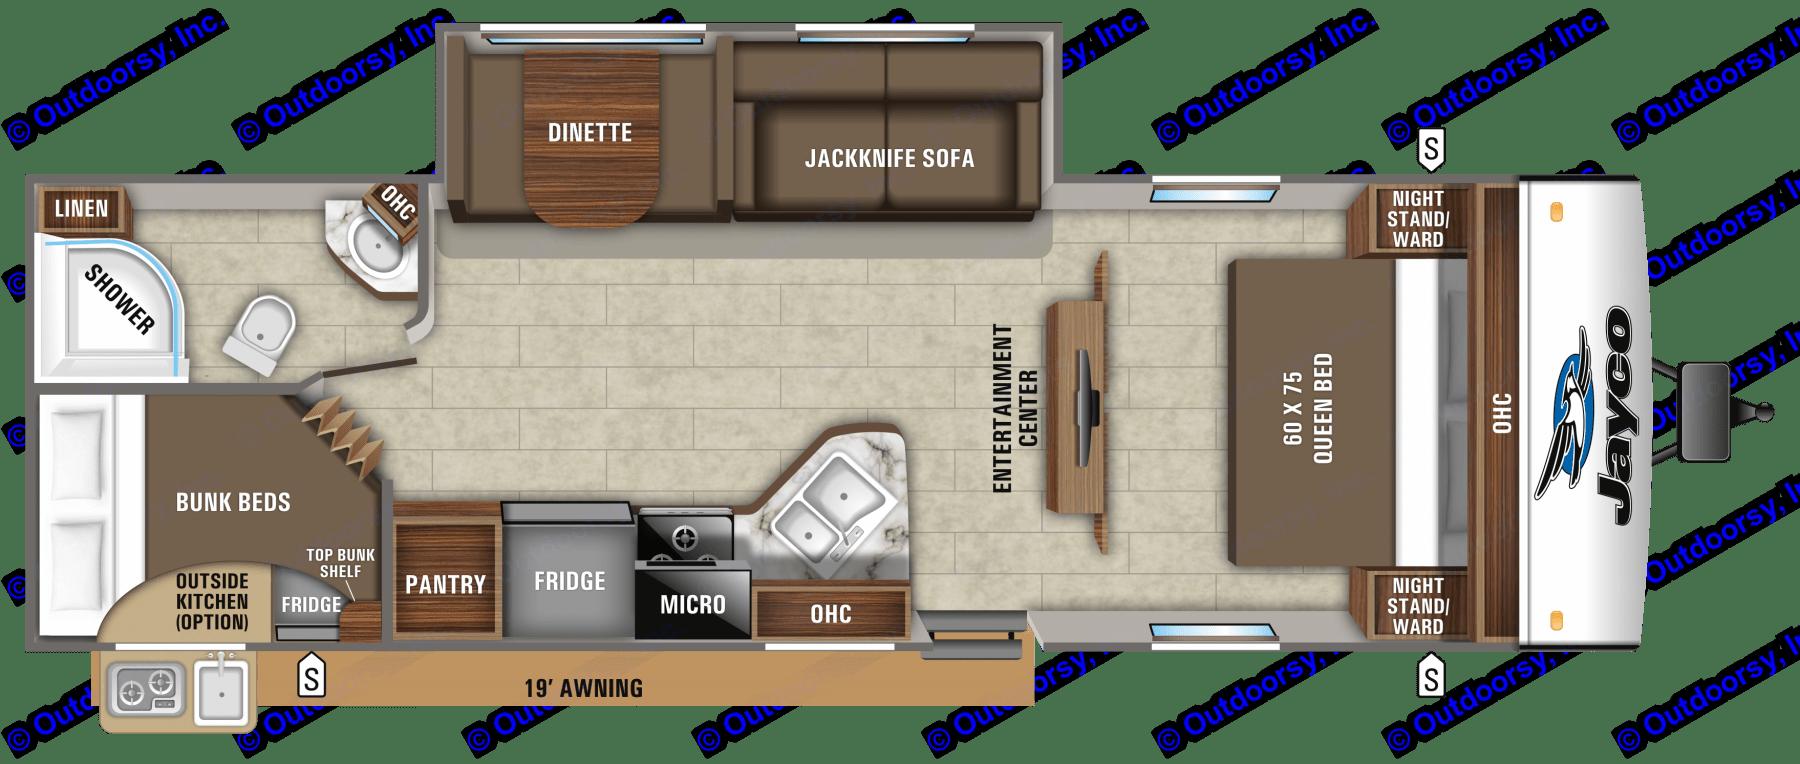 Jayco Jay Feather Ultra Lite 2019